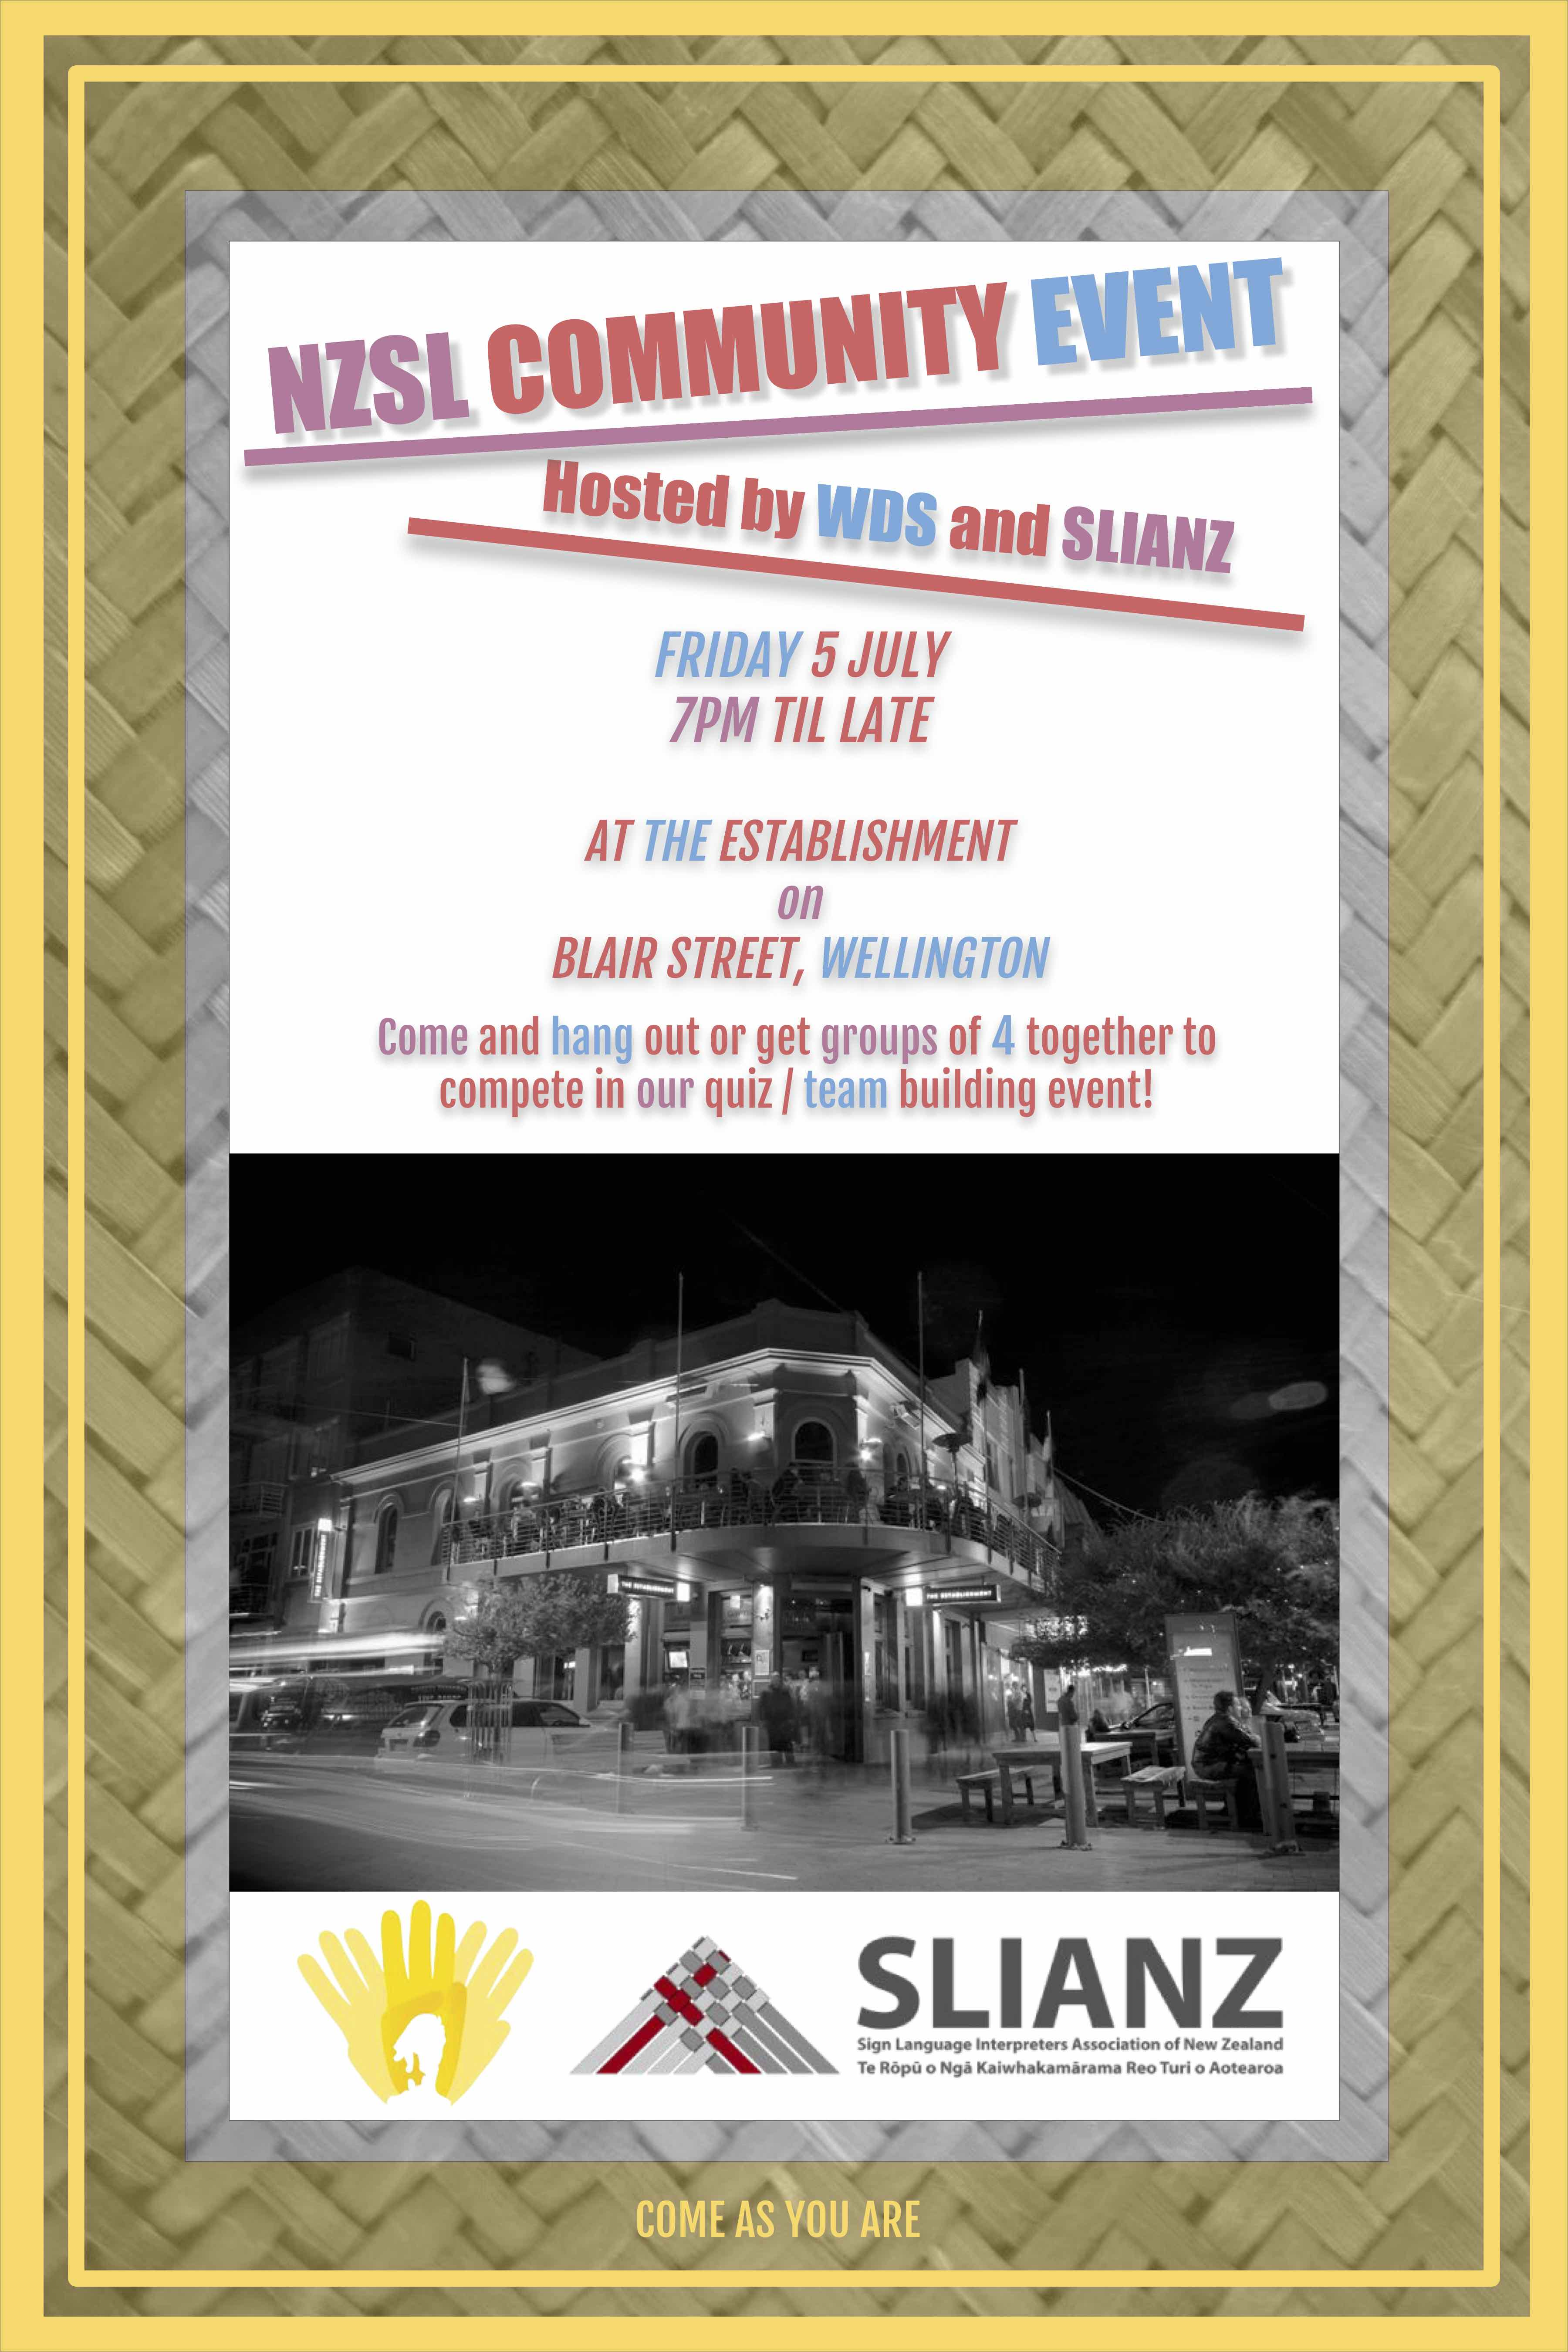 SLIANZ WDS event flyer